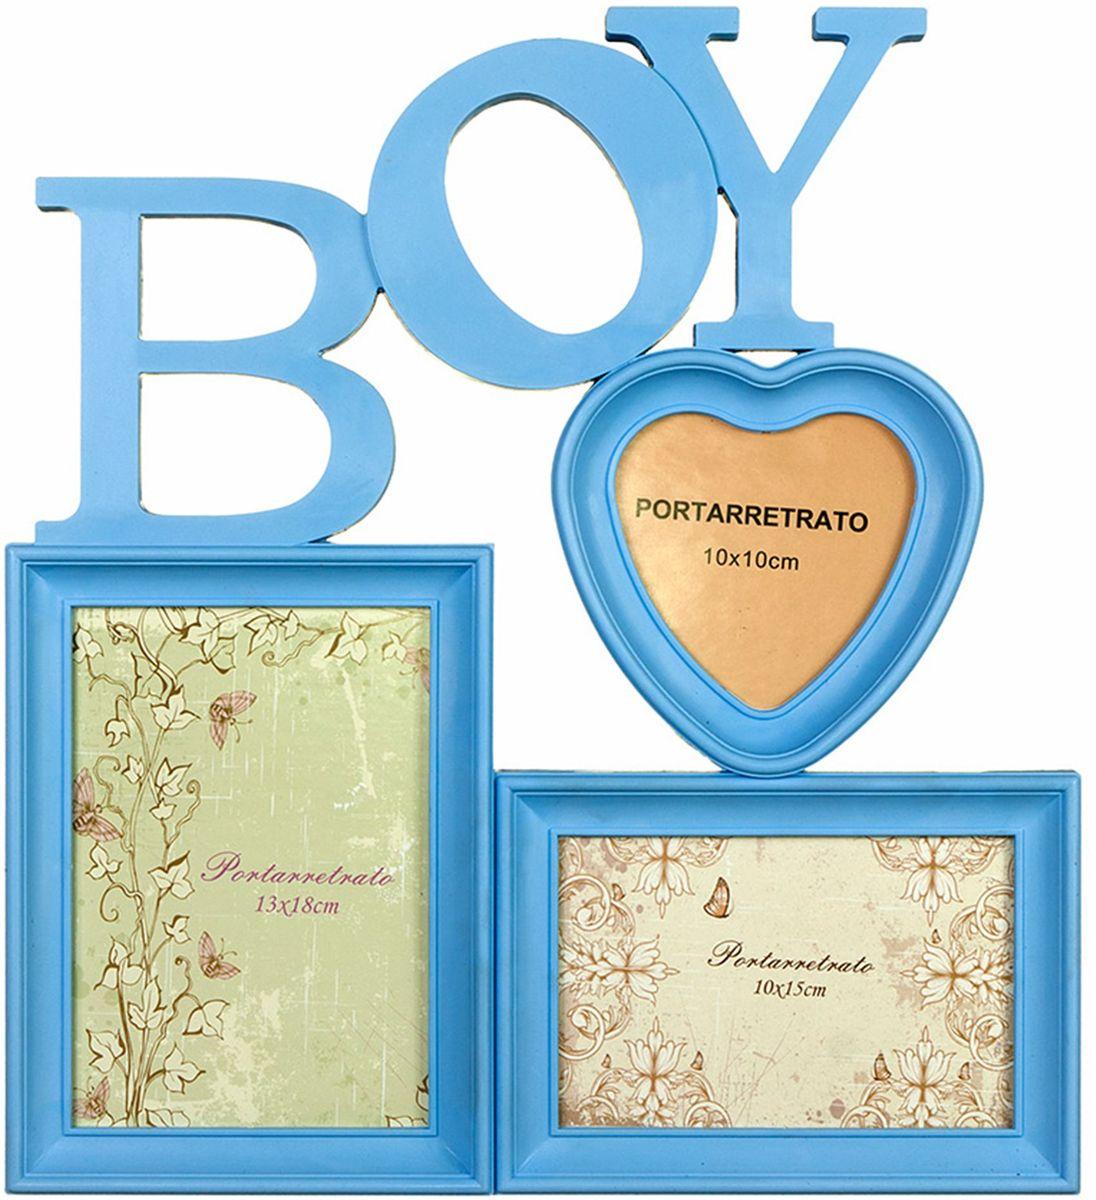 Фоторамка-коллаж Platinum Boy, цвет: голубой, 3 фоторамки. BIN-1122915 фоторамка коллаж moretto на 8 фото 238003